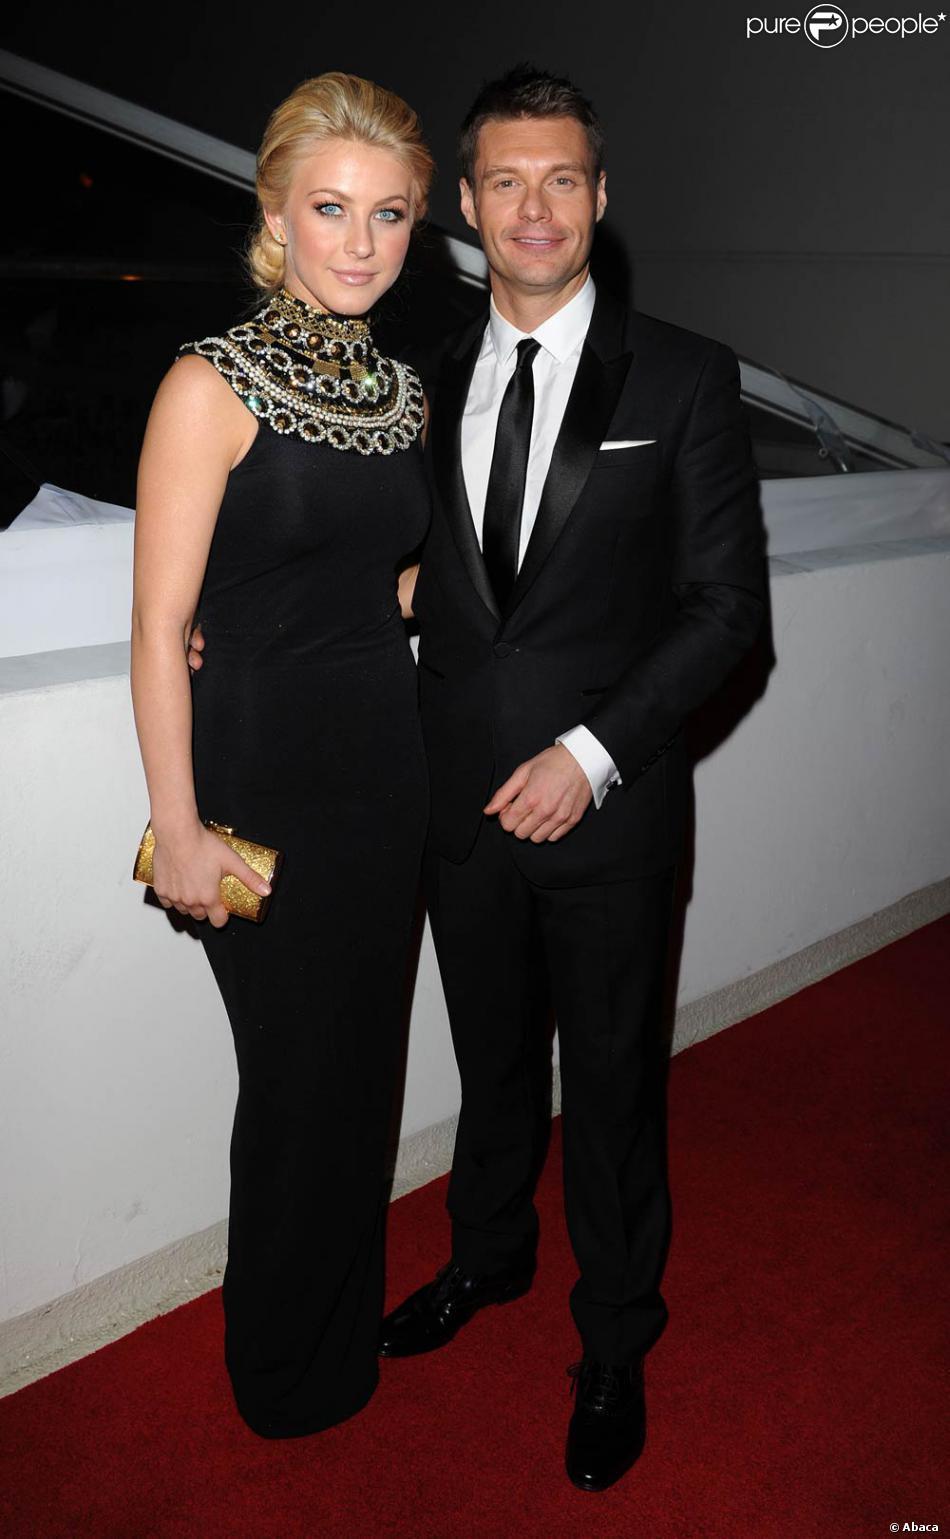 julianne hough dating ryan seacrest 2011 camaro